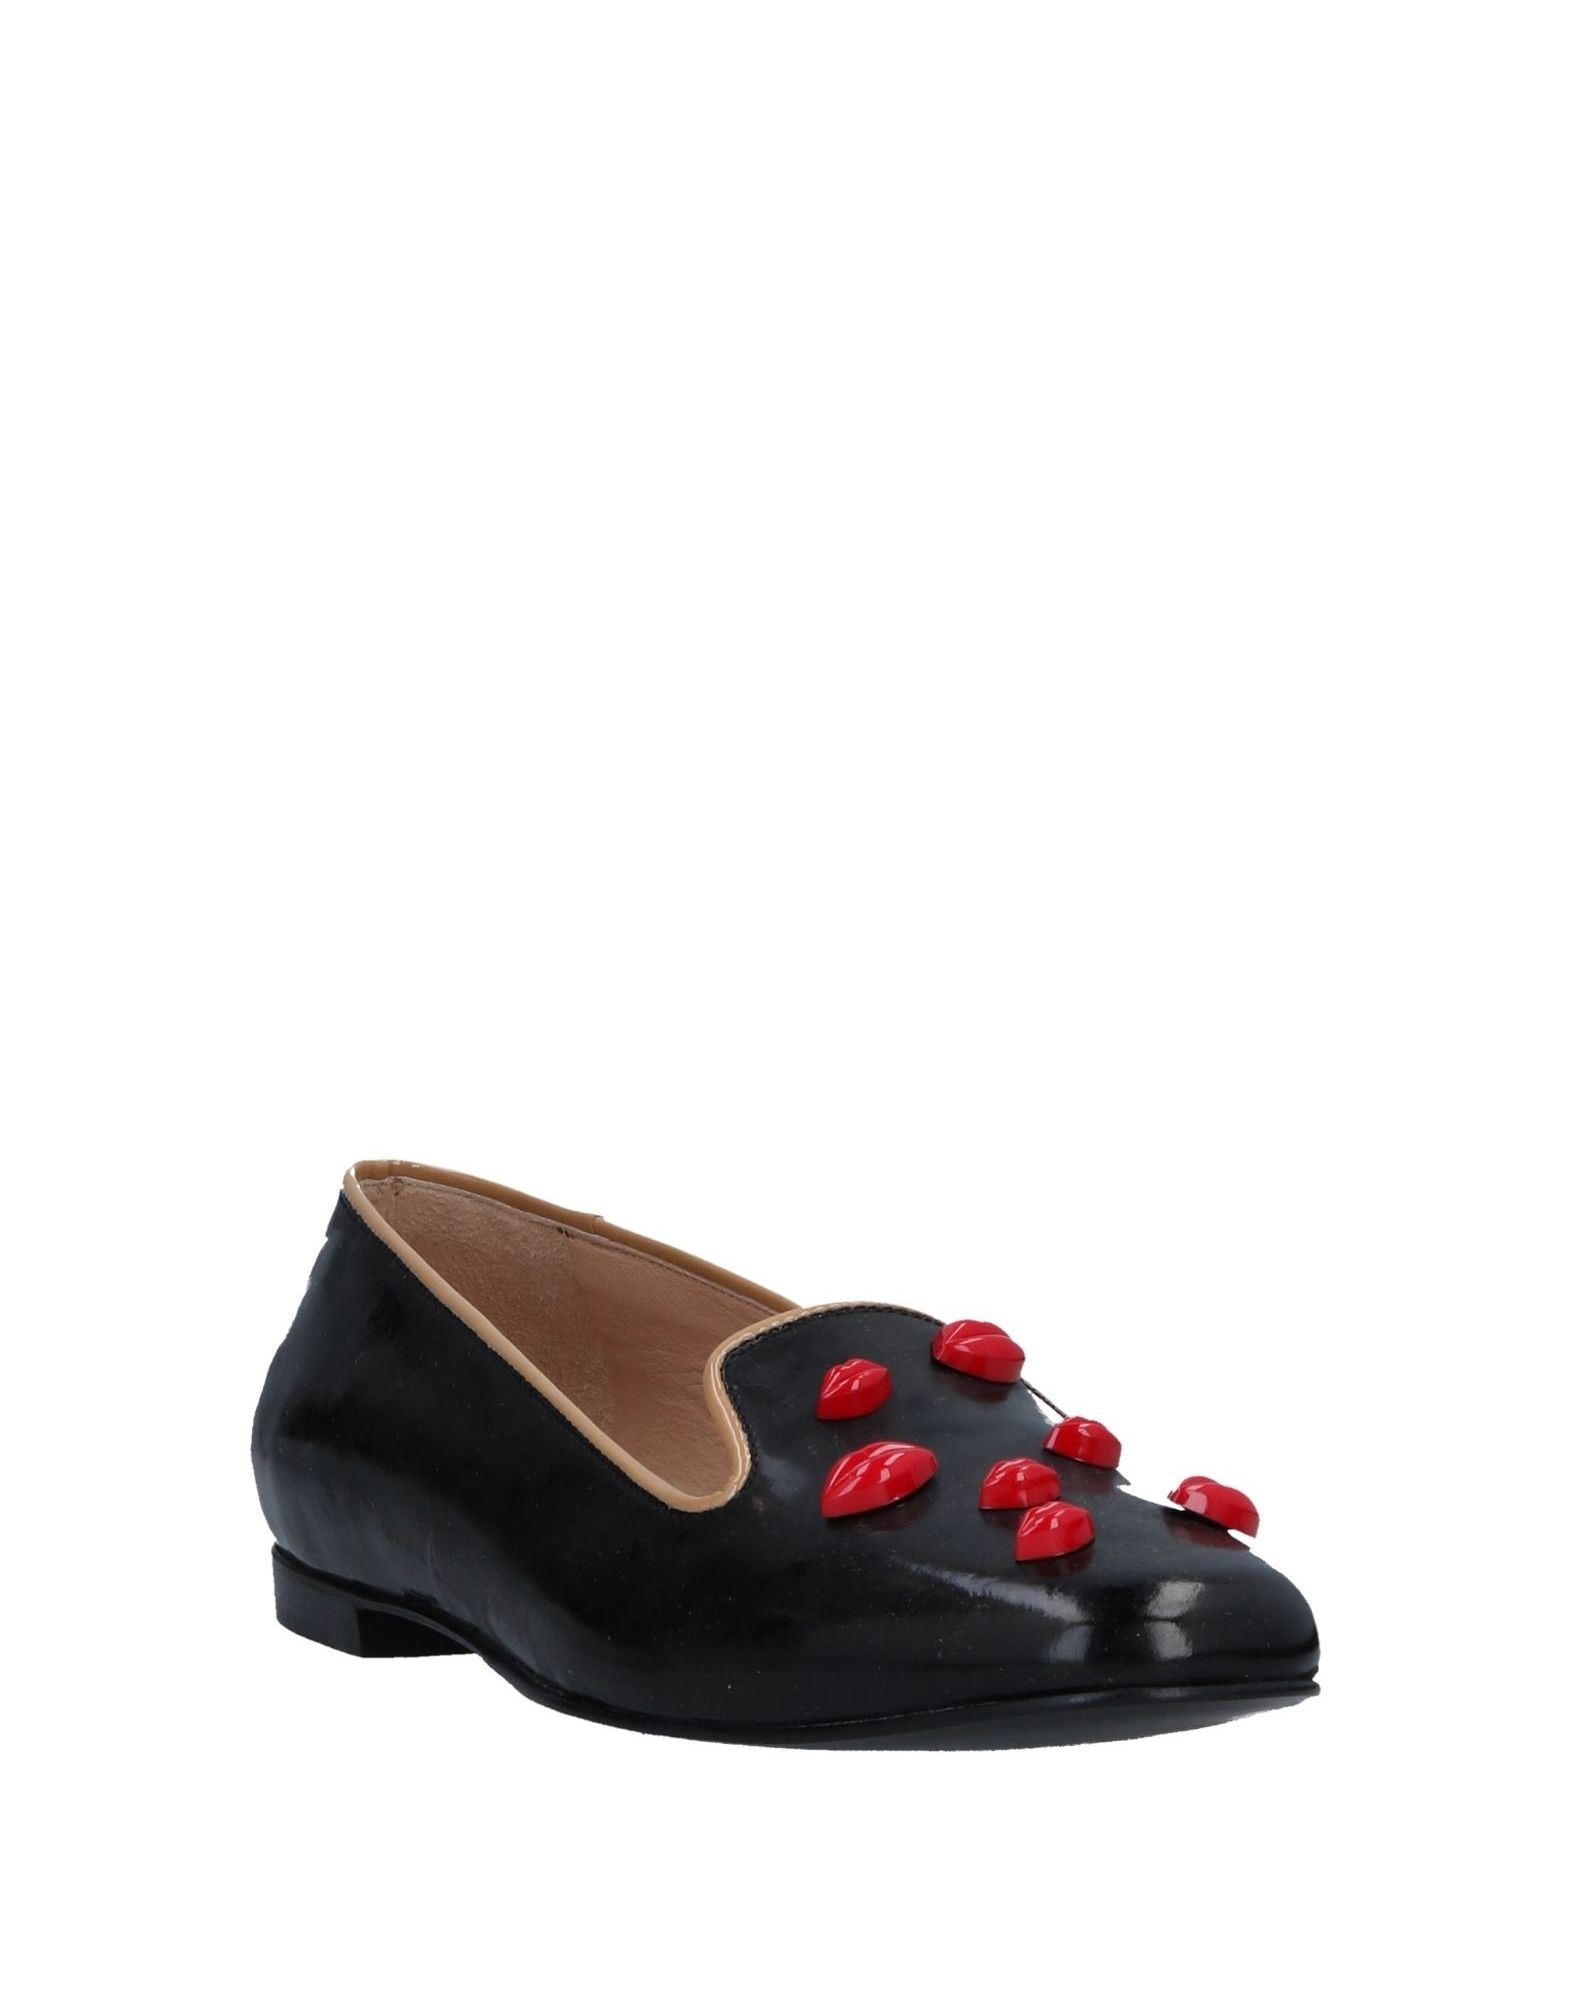 Markus Lupfer Mokassins Damen    11322529NX Neue Schuhe 6ba3bb